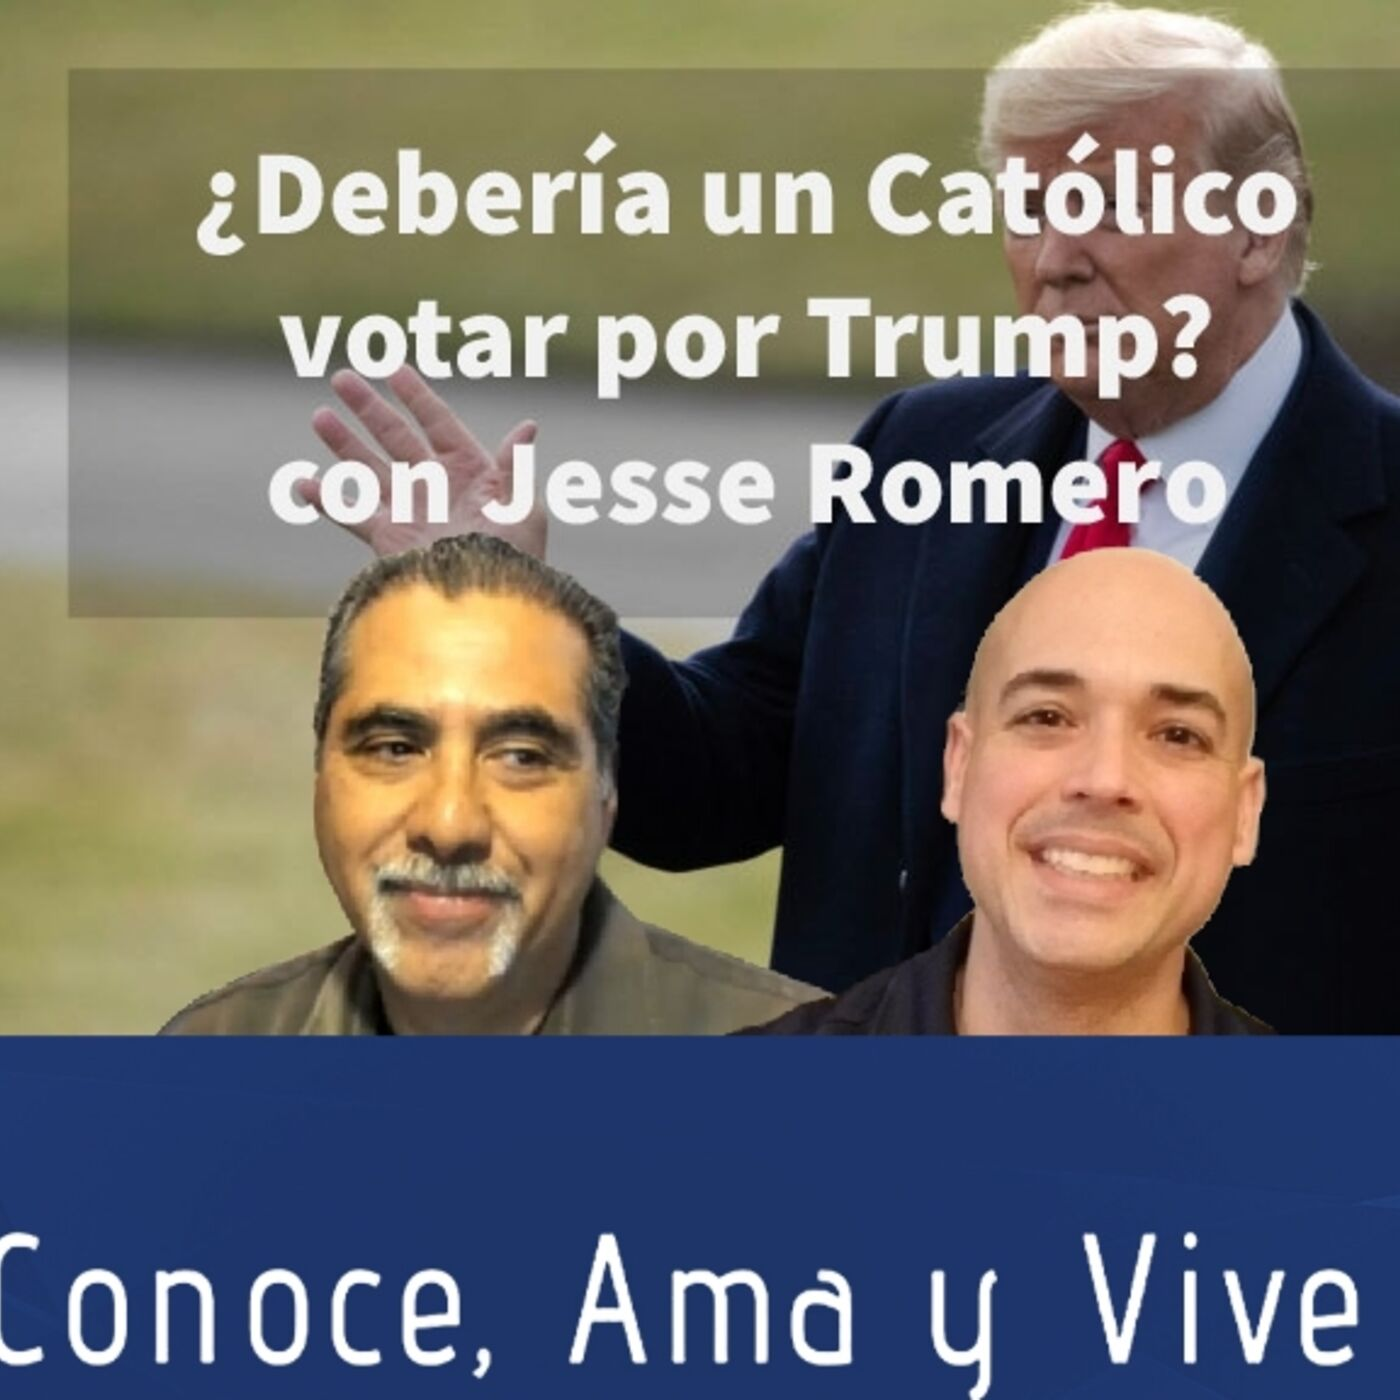 Episodio 255: 🤷♂️ ¿Debería un católico votar por Donald Trump? ✝  con Jesse Romero👏 ¿Debería votar demócrata? 🚫